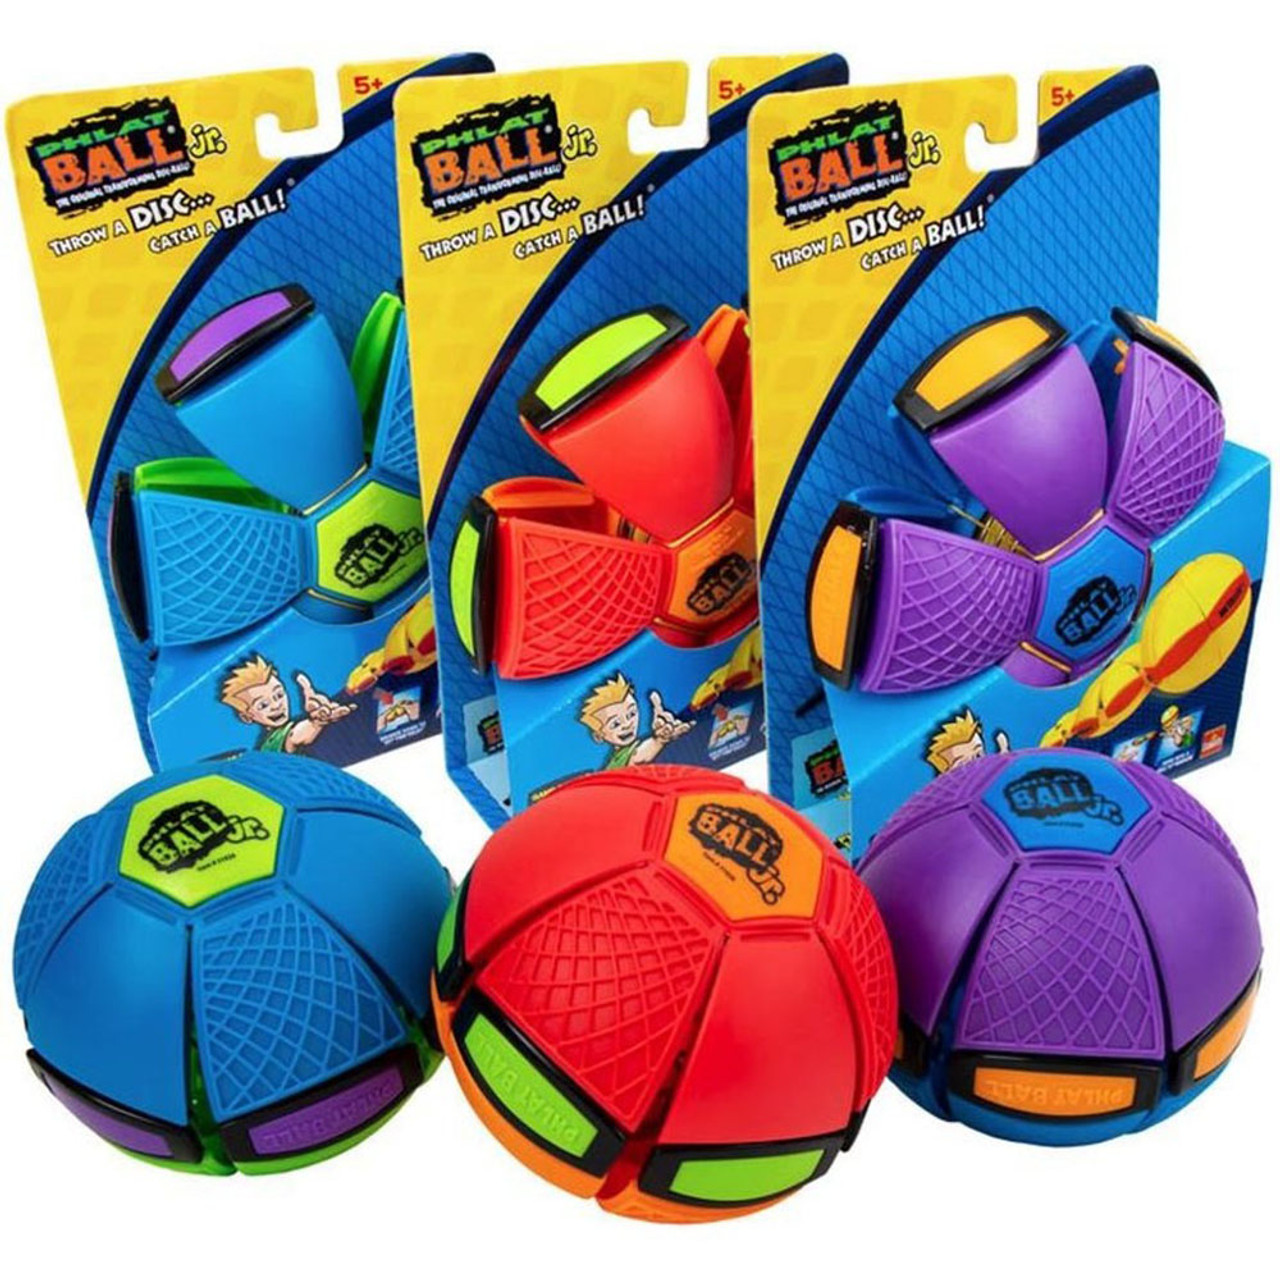 Goliath Sports Phlat Ball Jr. Transforming Disc Ball